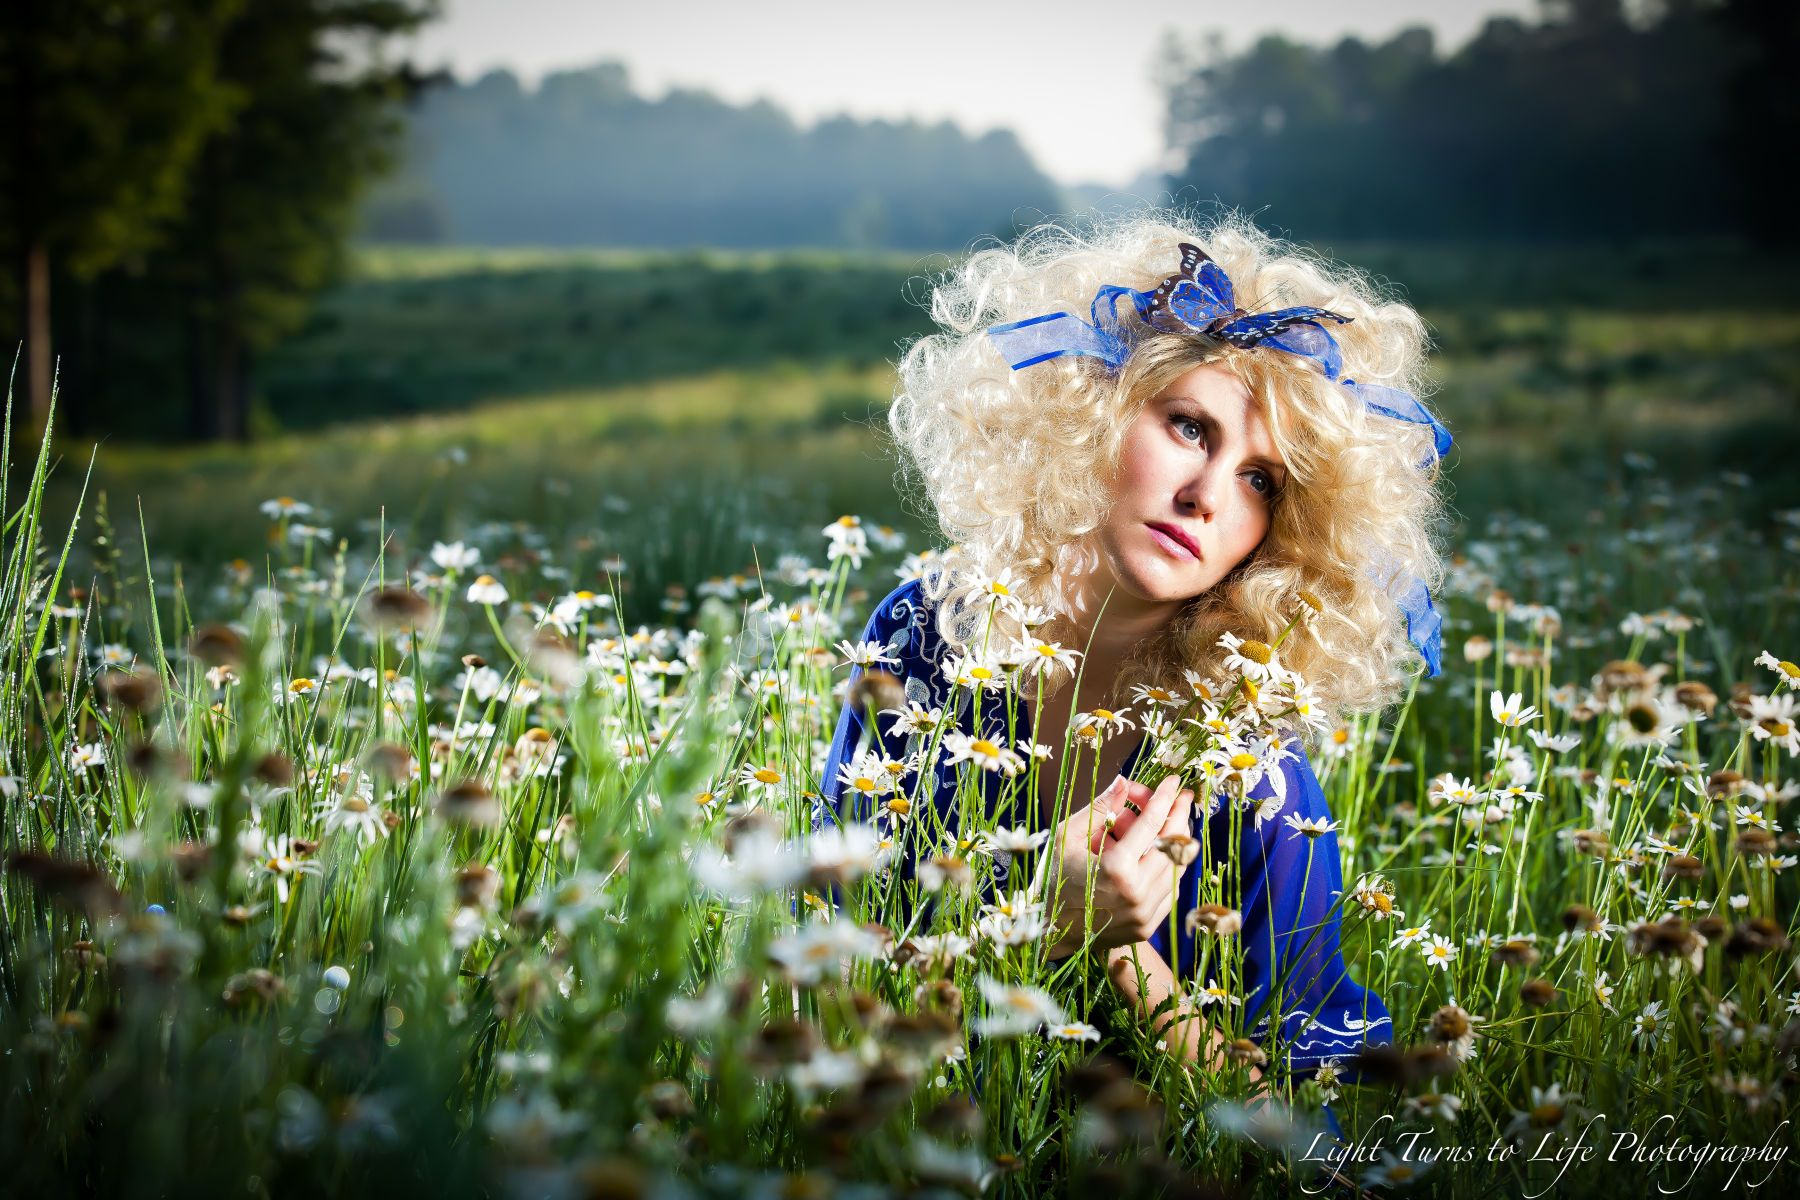 1r20120505__1205_k_wildflowers_066_edit120505copyright_2011_vinson_smith